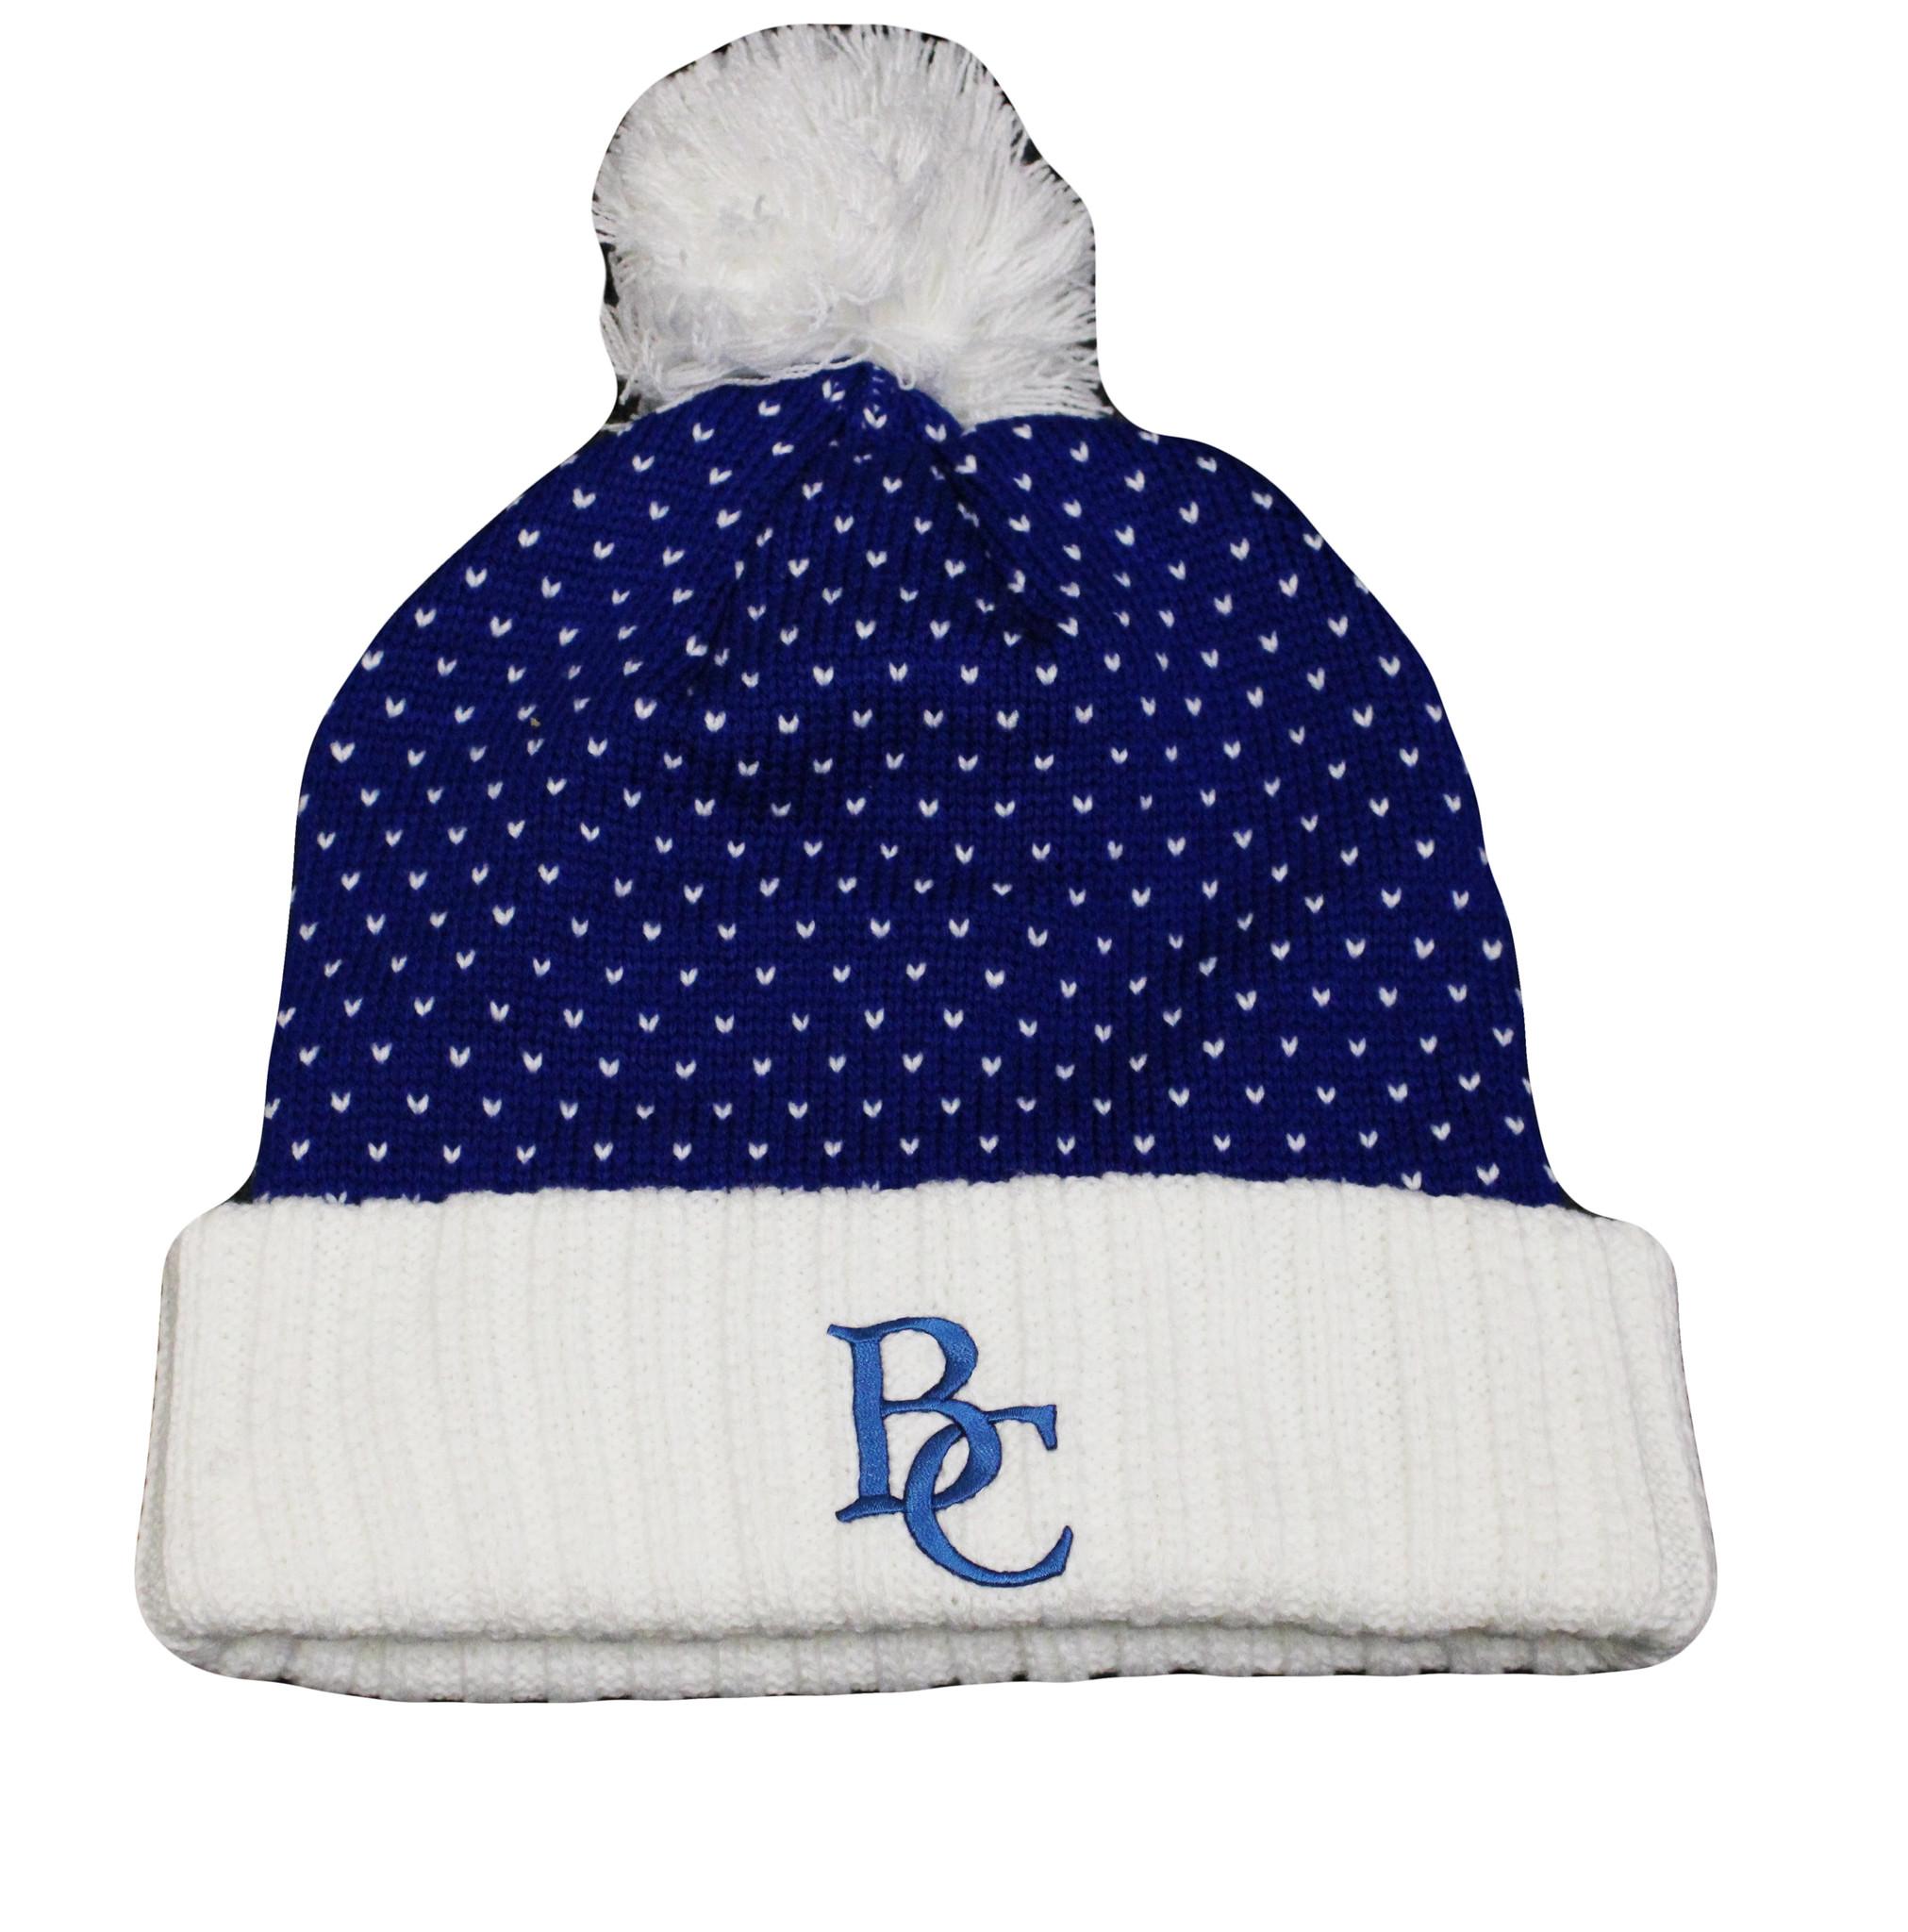 BC Knit Dot Pattern Hat-1